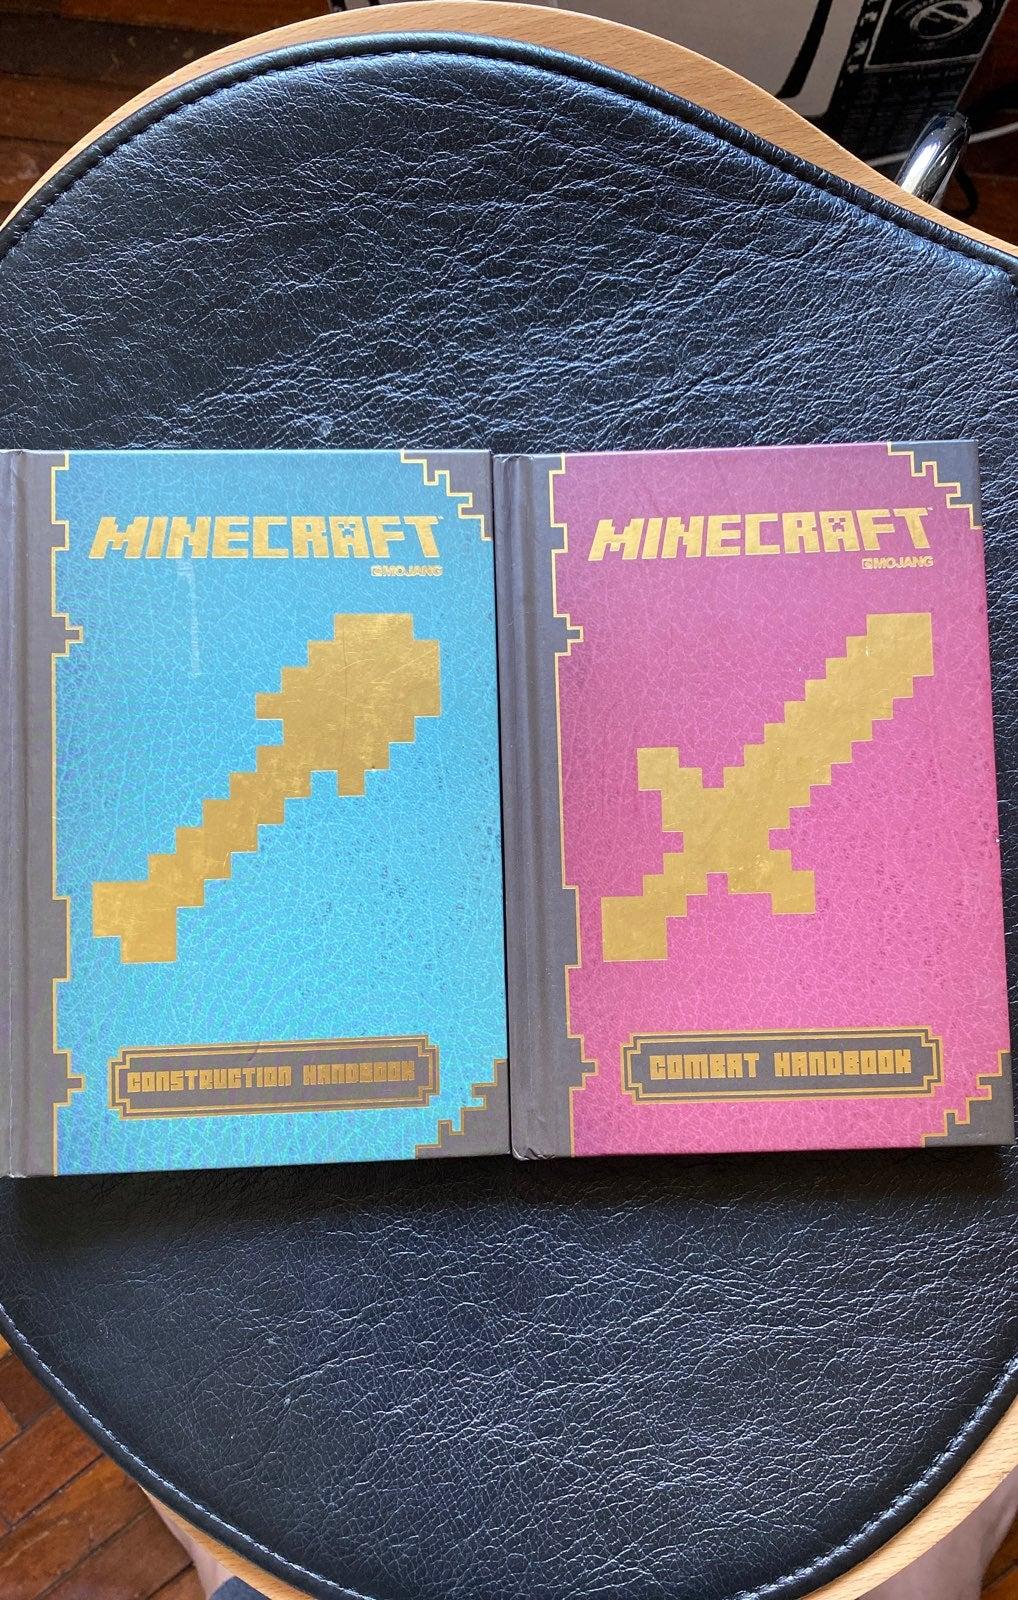 Minecraft Combat and Construction Handbo